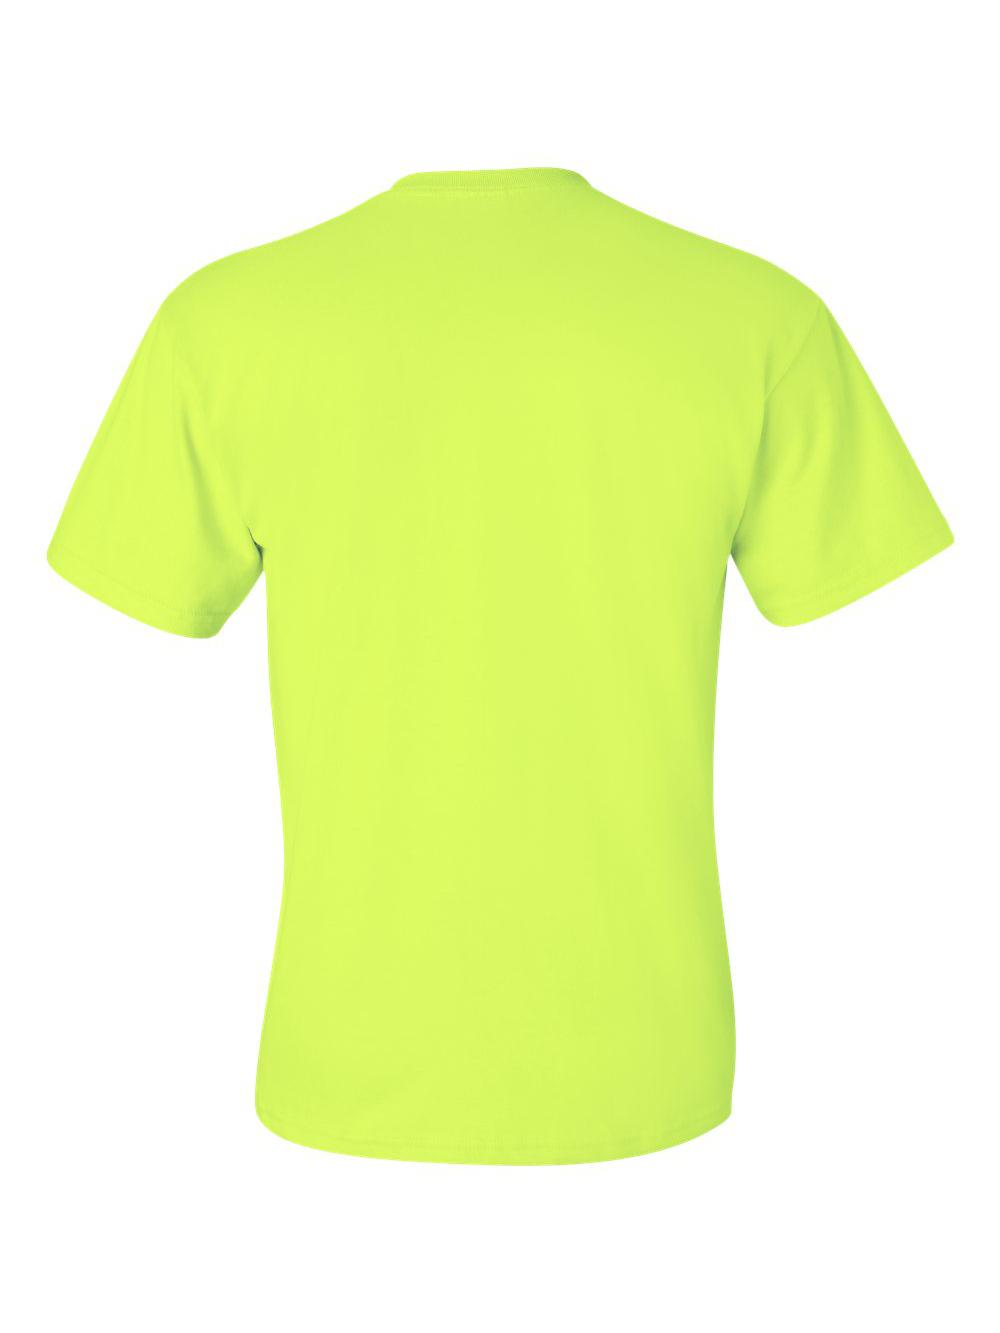 Gildan-Ultra-Cotton-T-Shirt-with-a-Pocket-2300 thumbnail 34